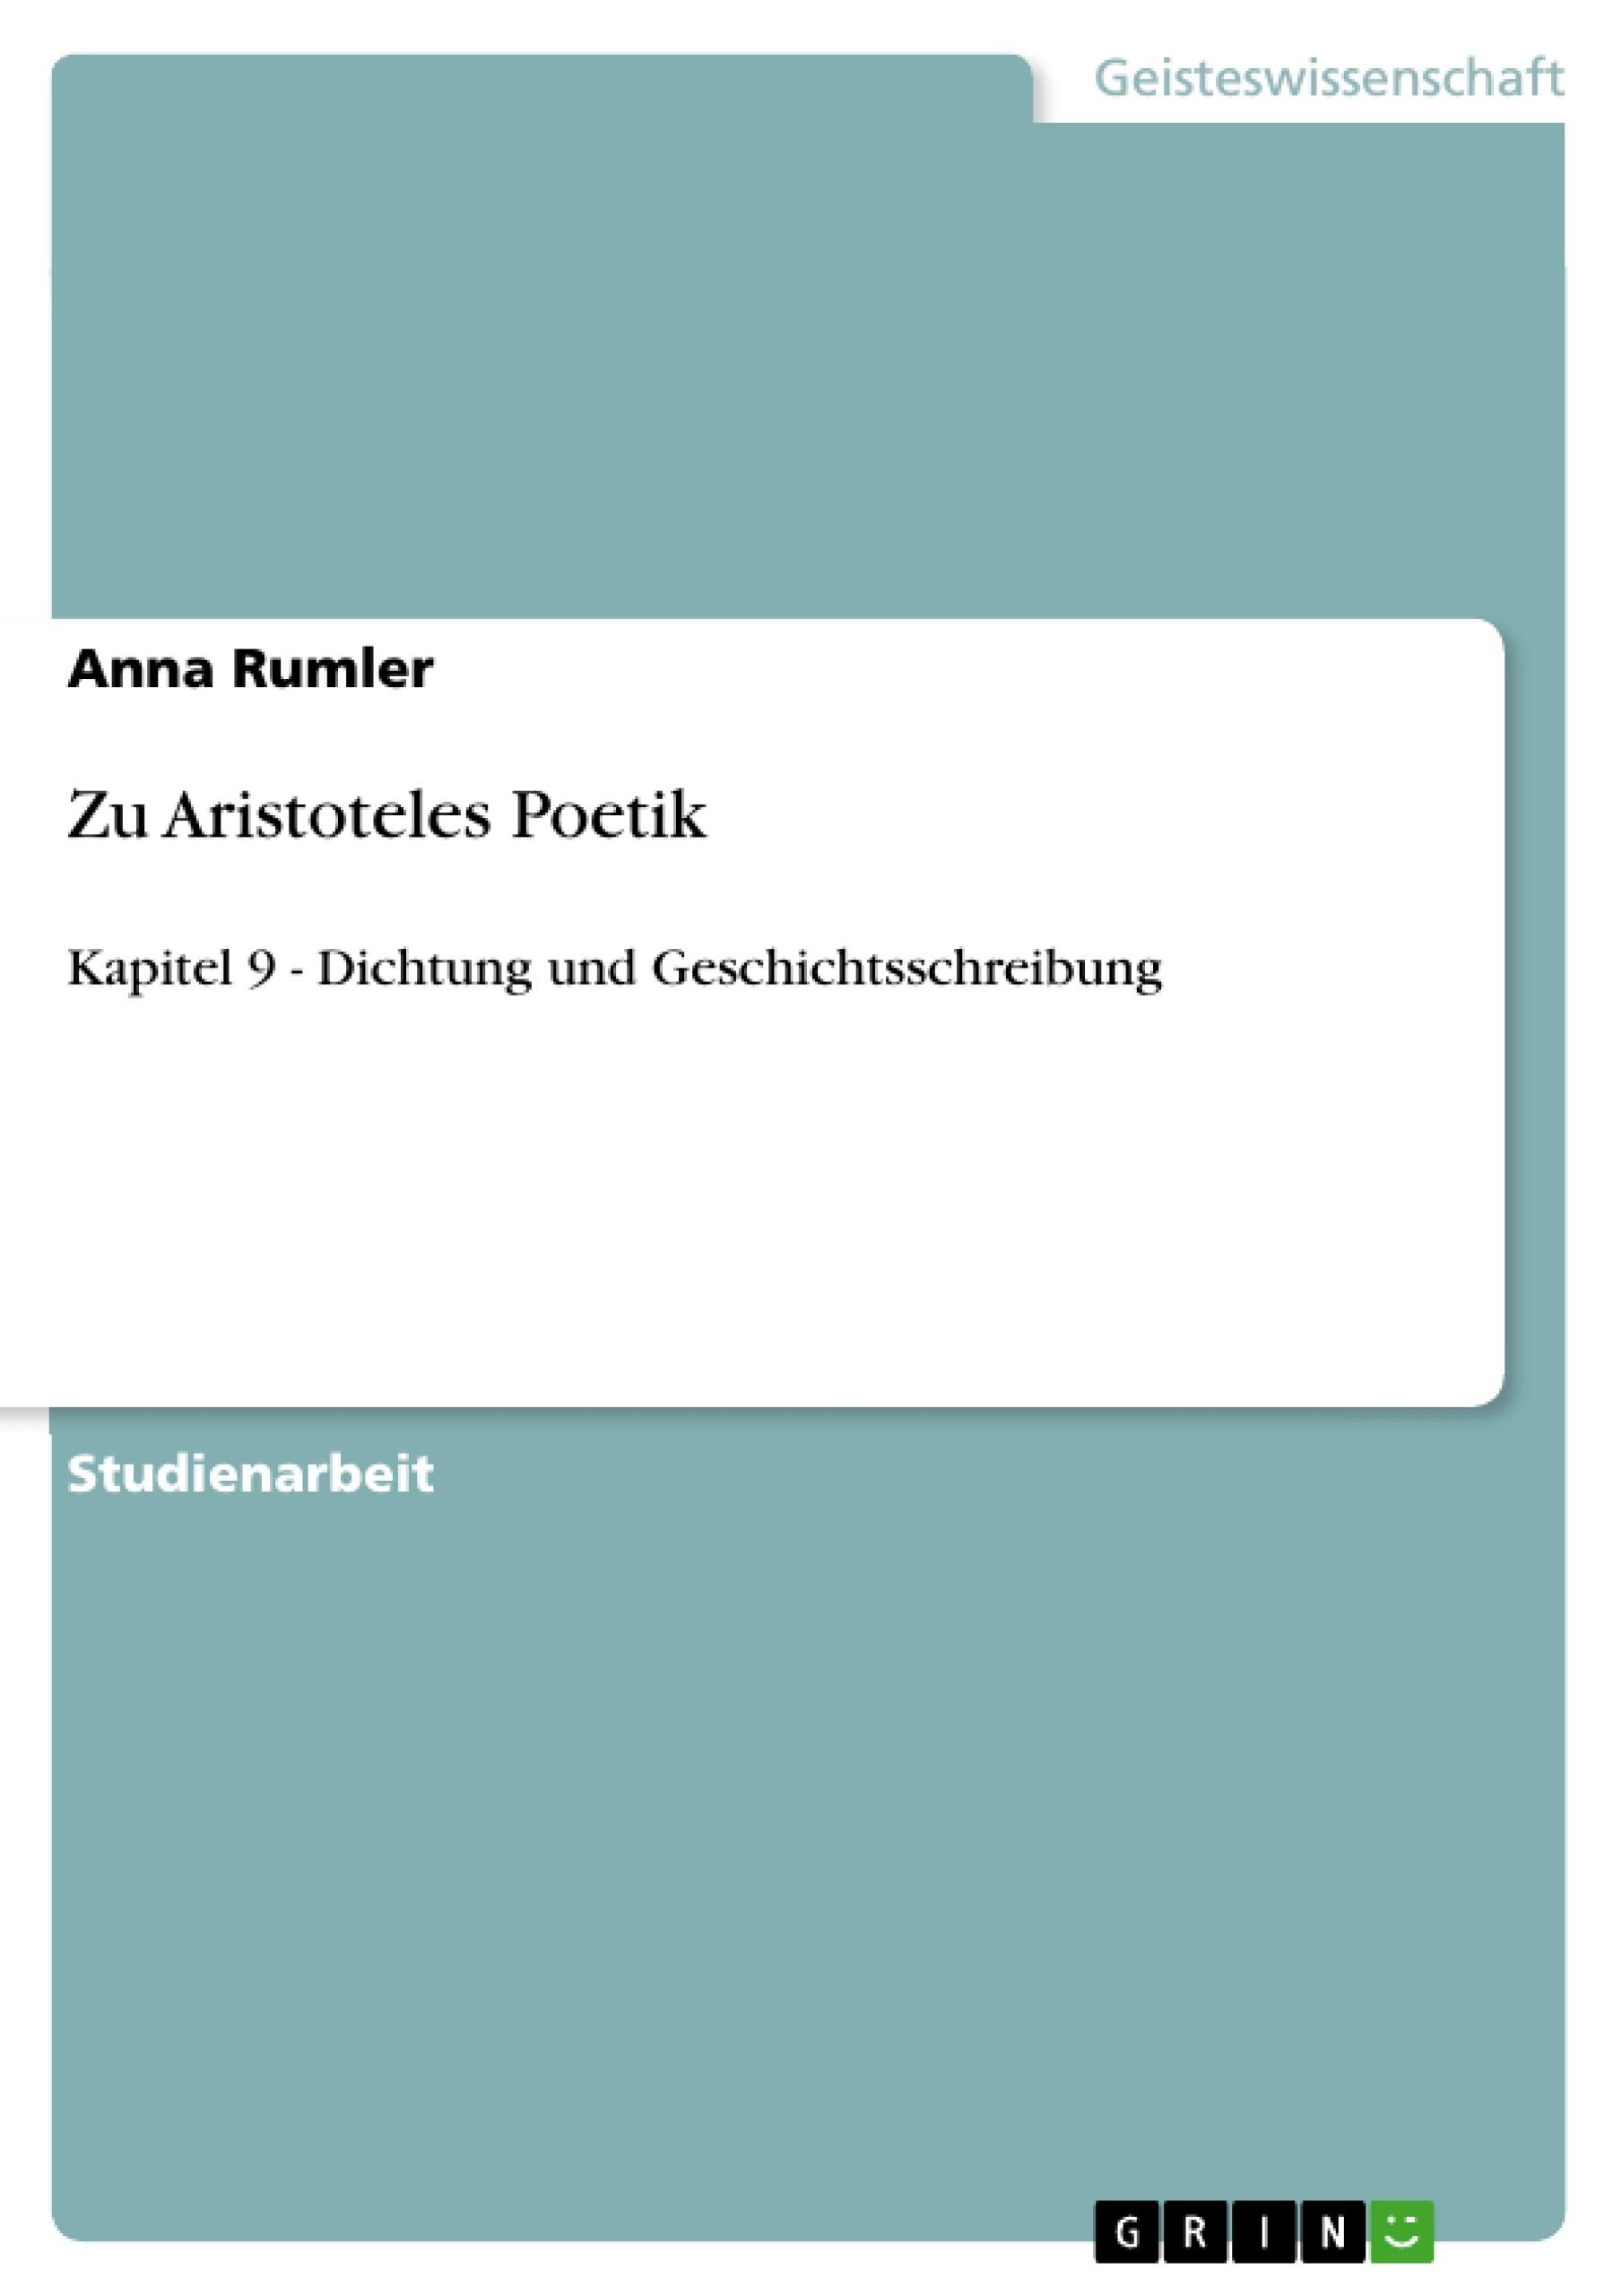 Titel: Zu Aristoteles Poetik